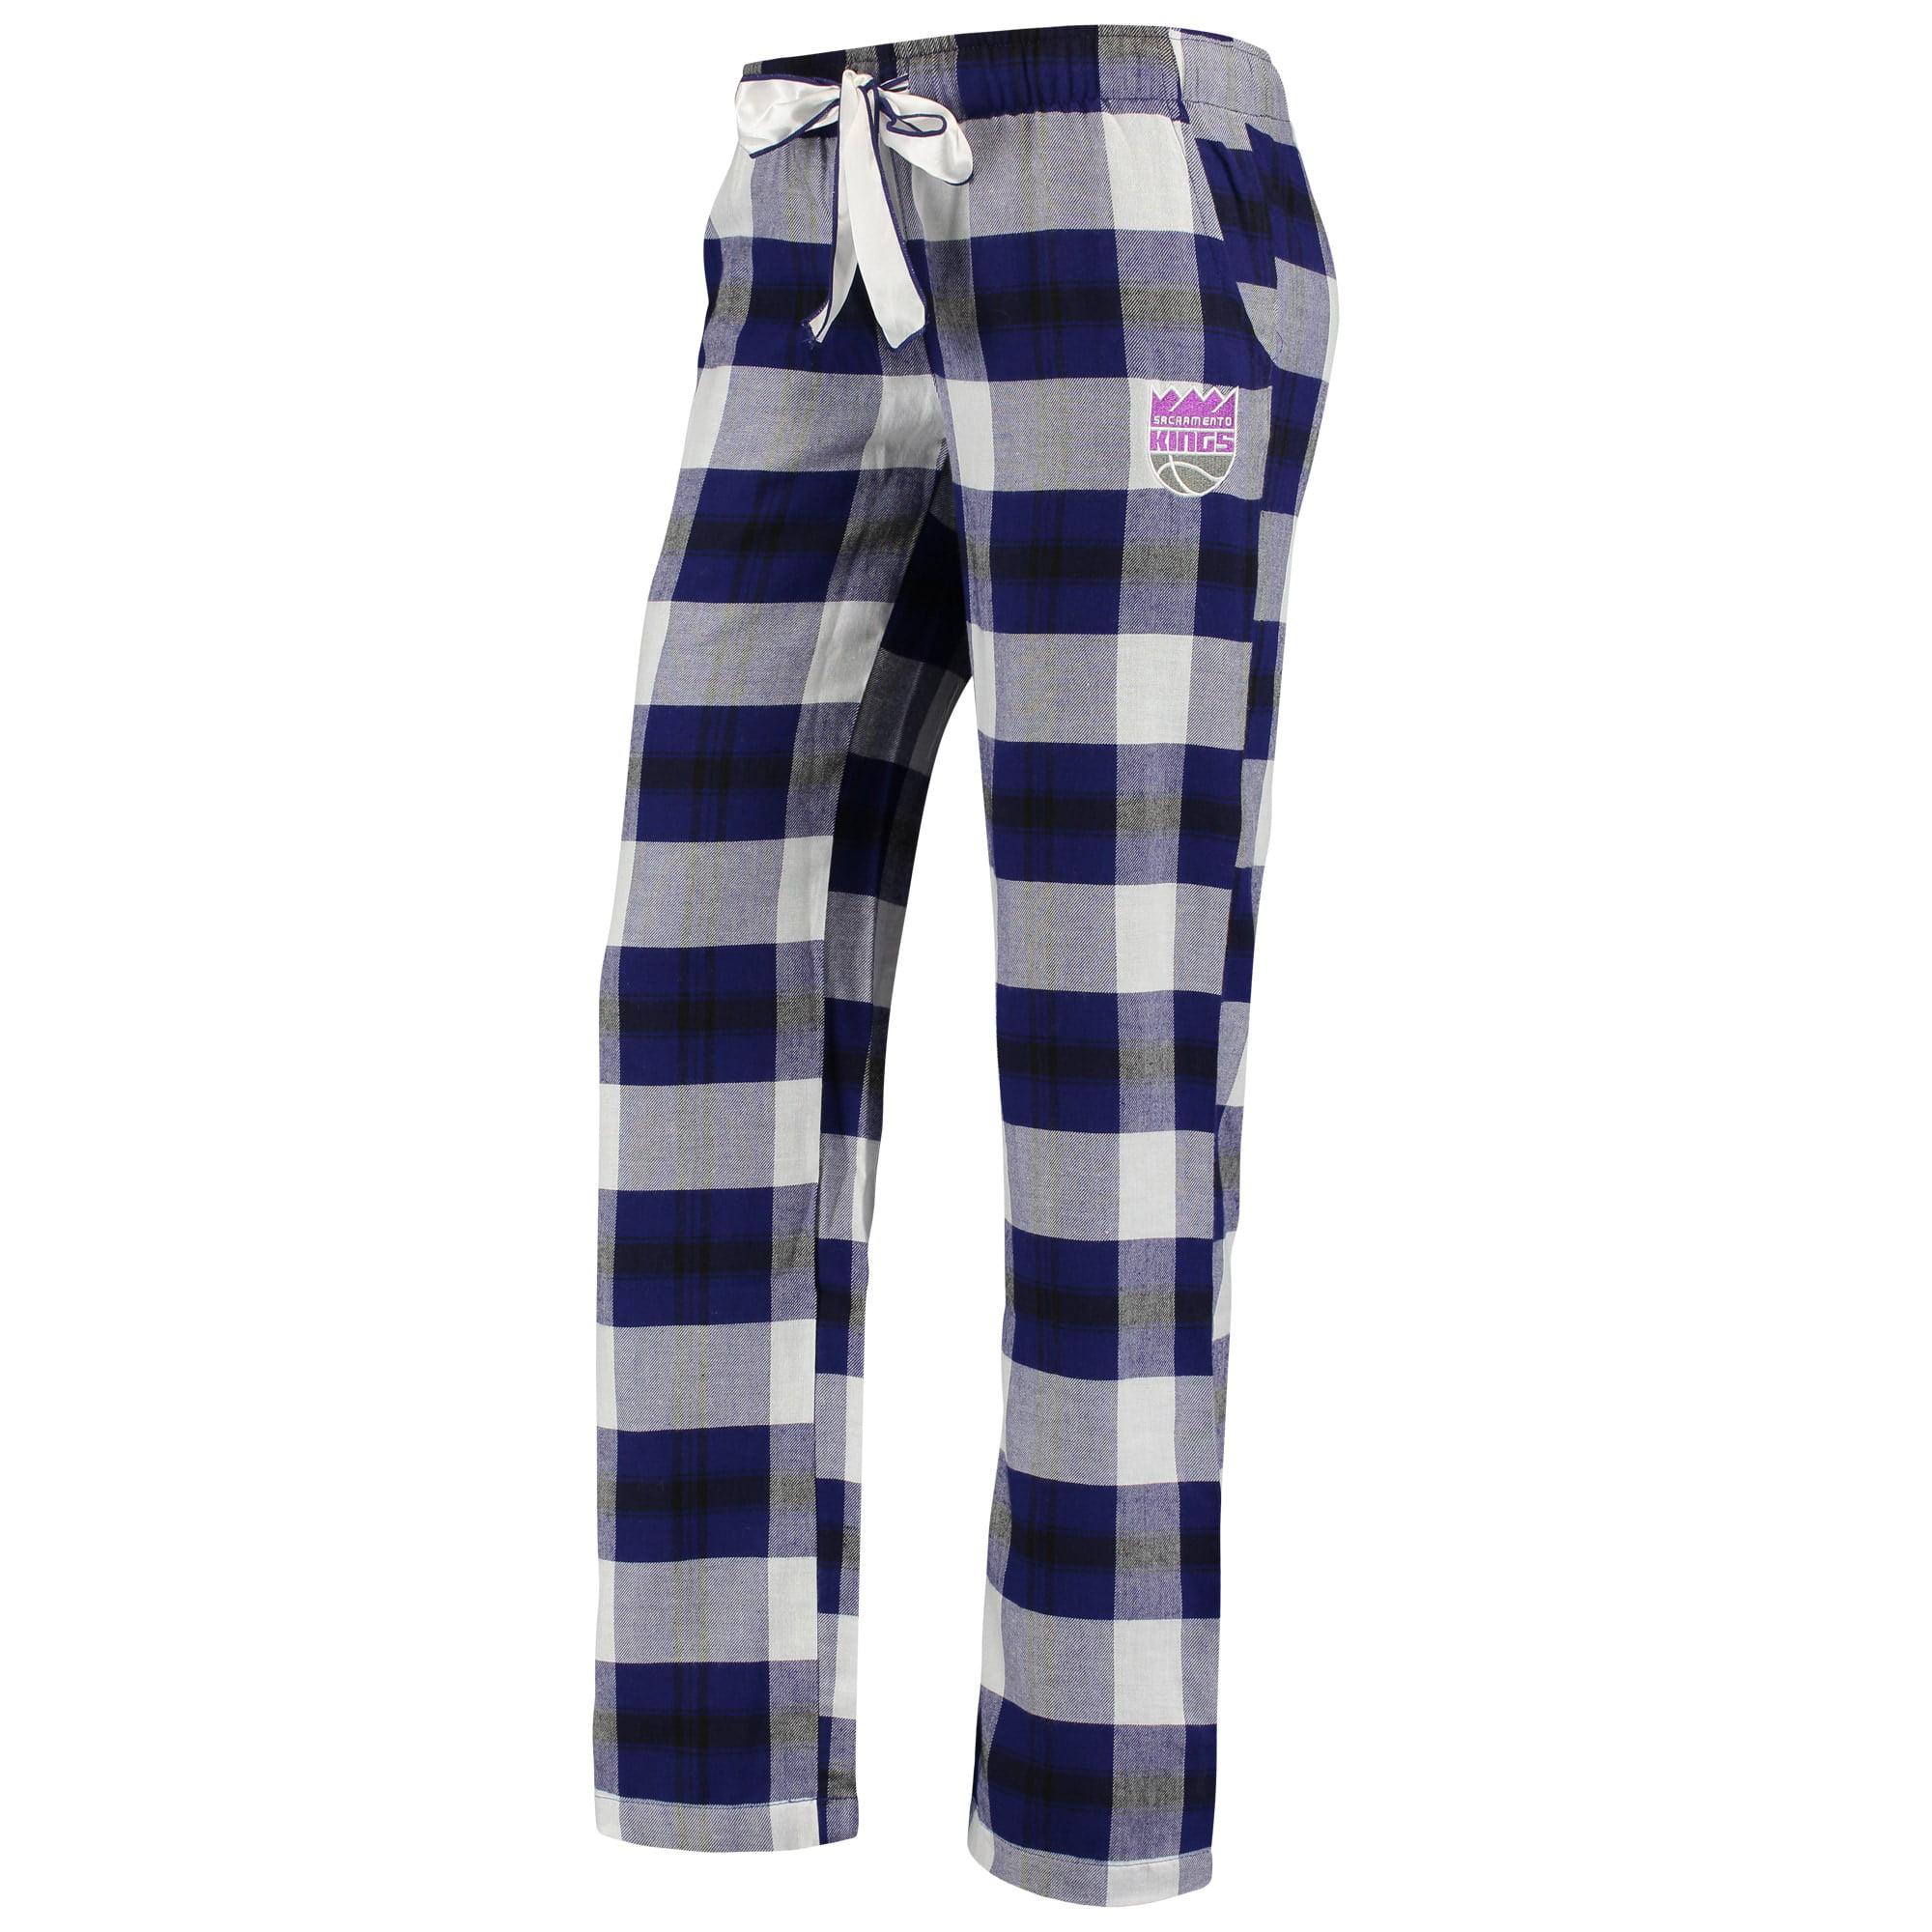 Concepts Sport Sacramento Kings Mens Pajama Pants Plaid Pajama Bottoms